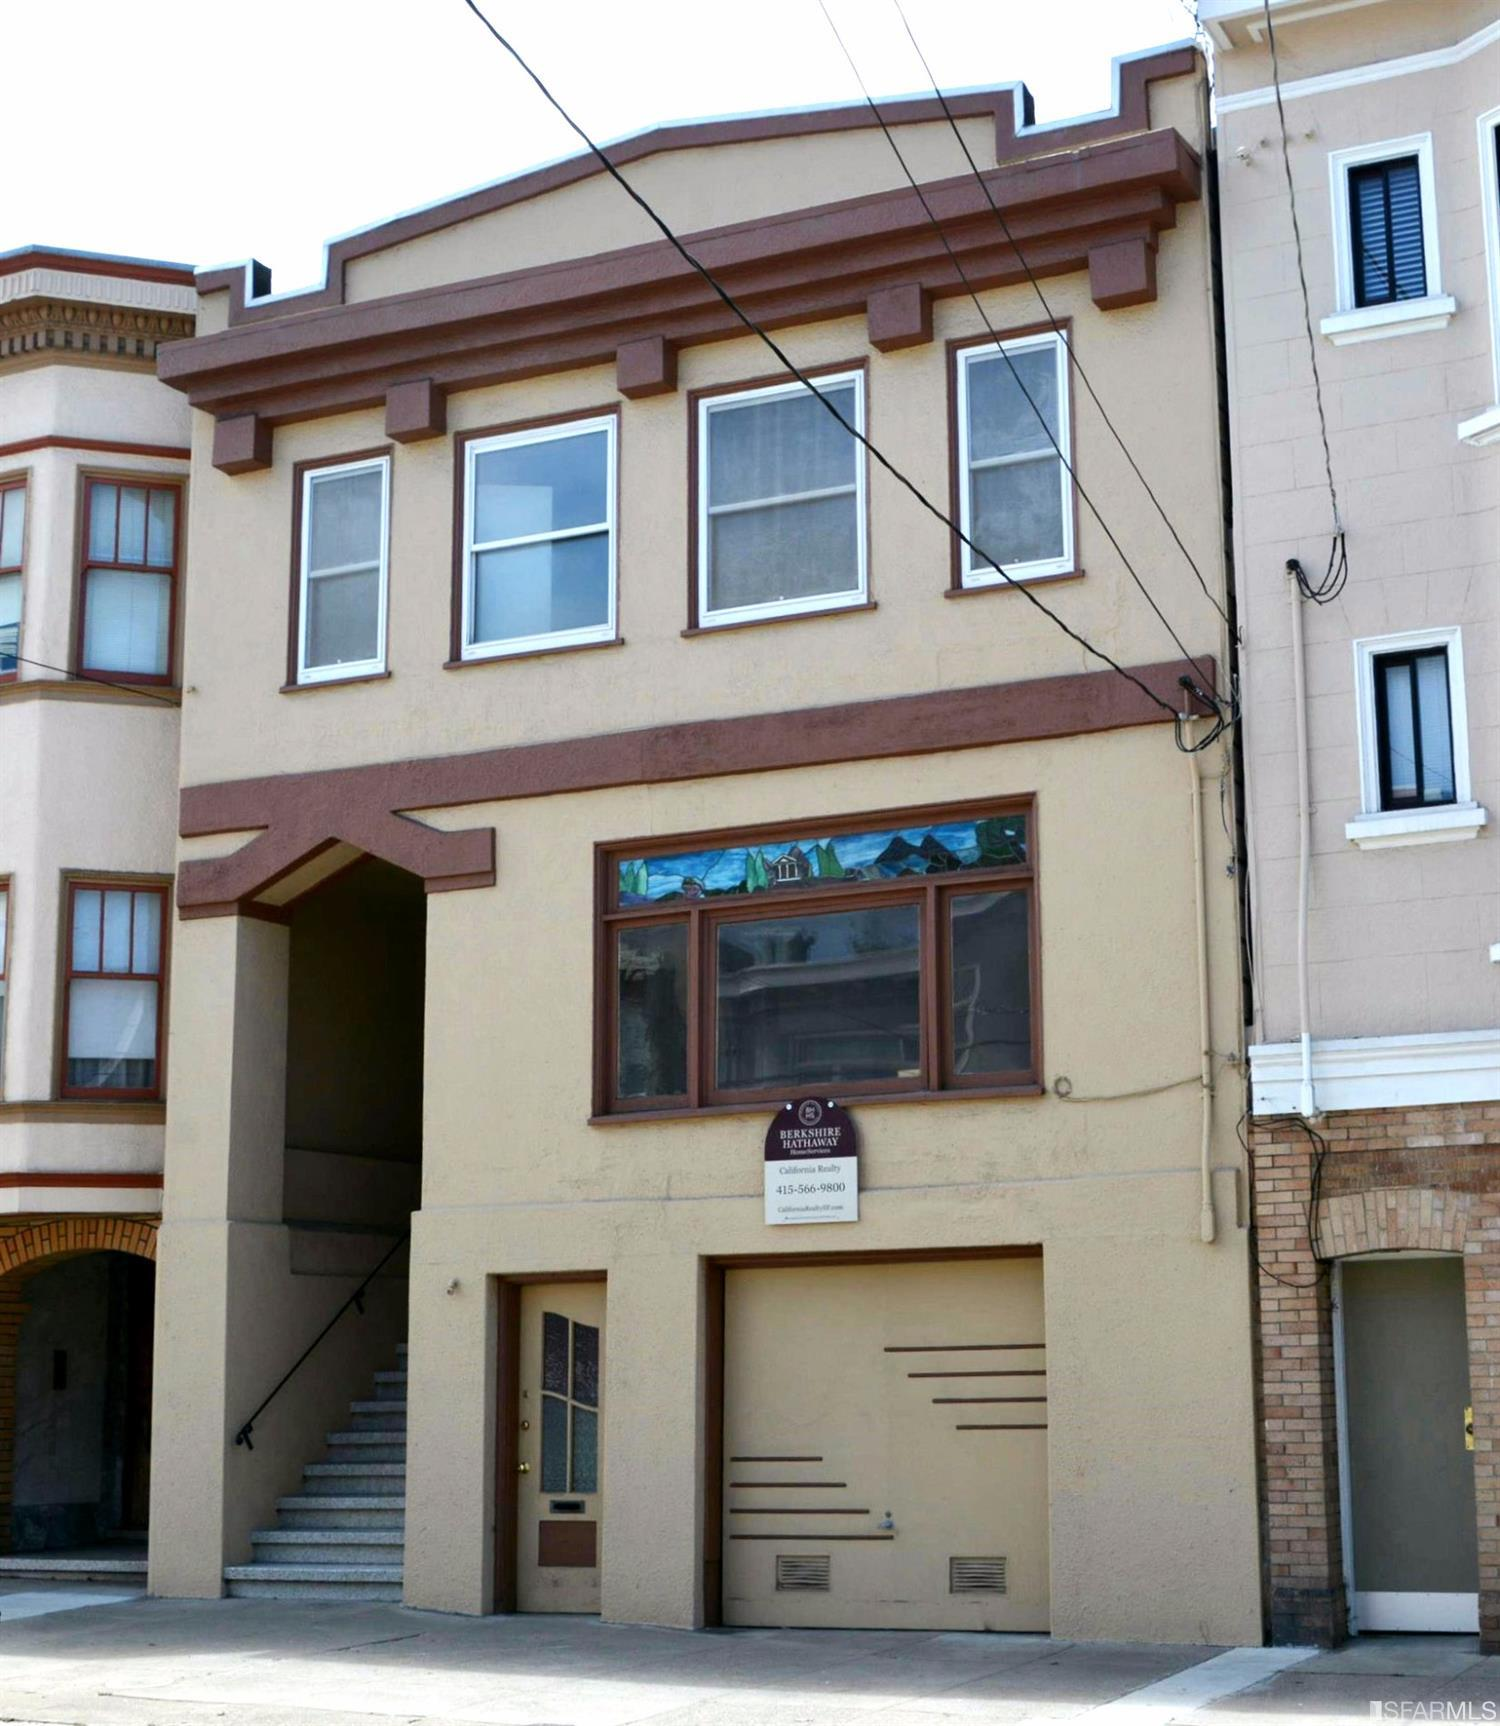 427 20th Ave, San Francisco, CA 94121